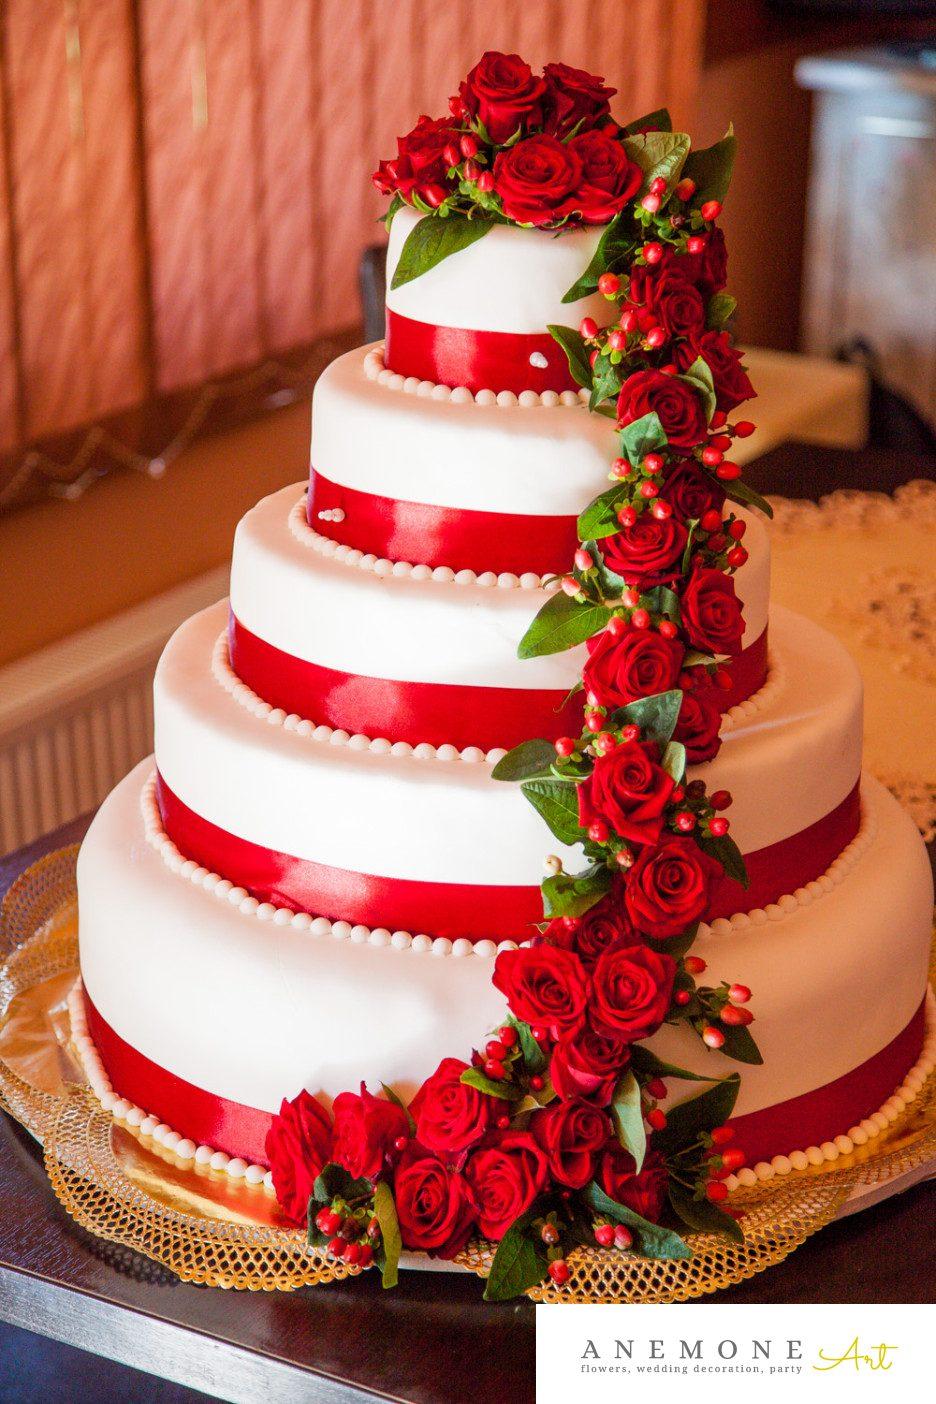 Poza, foto cu Flori de nunta decor tort, rosu, trandafiri in Arad, Timisoara, Oradea (wedding flowers, bouquets) nunta Arad, Timisoara, Oradea